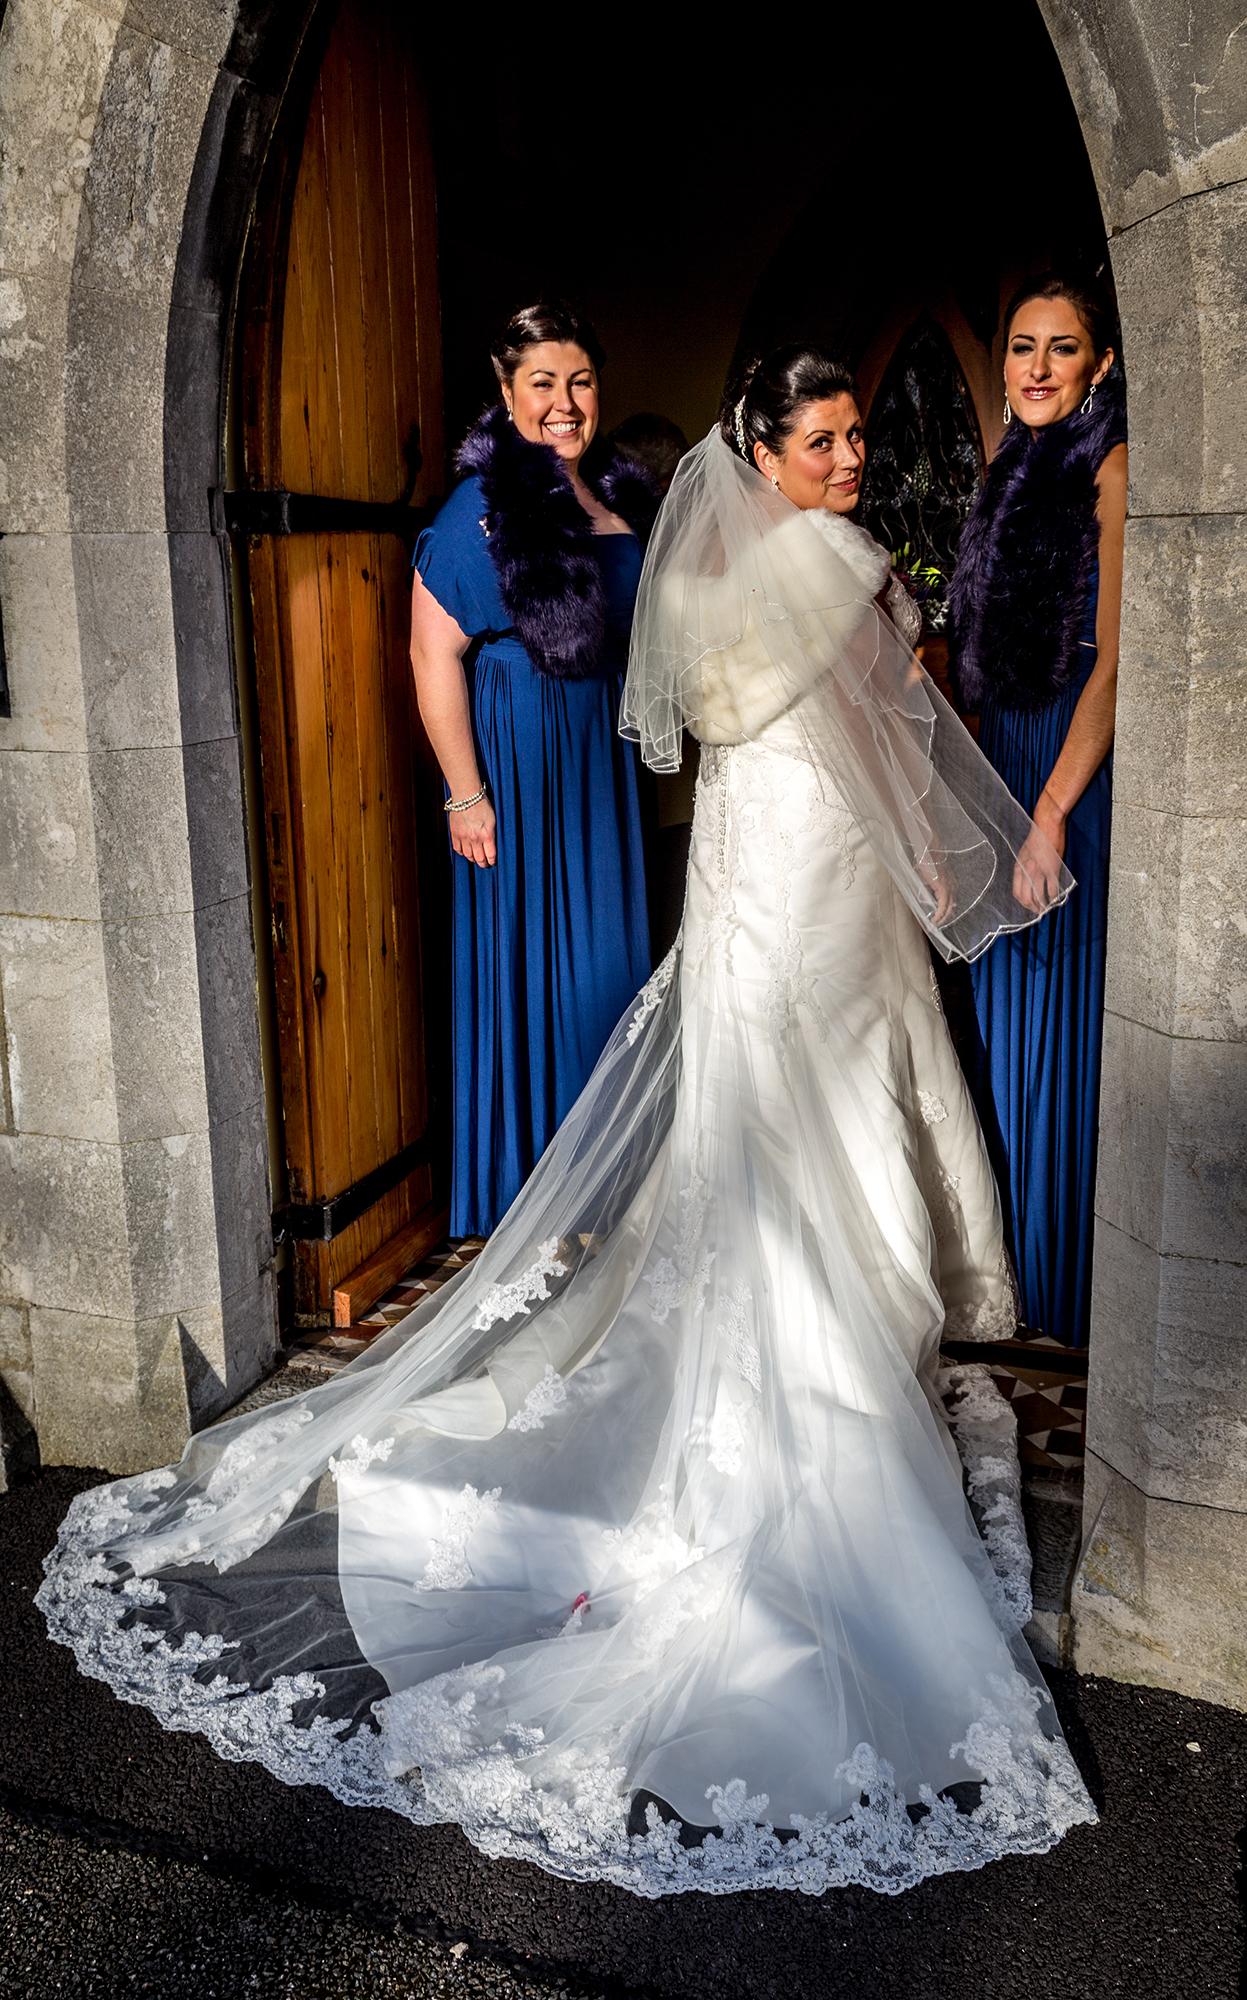 wedding in Ireland, Tralee, Co. Kerry